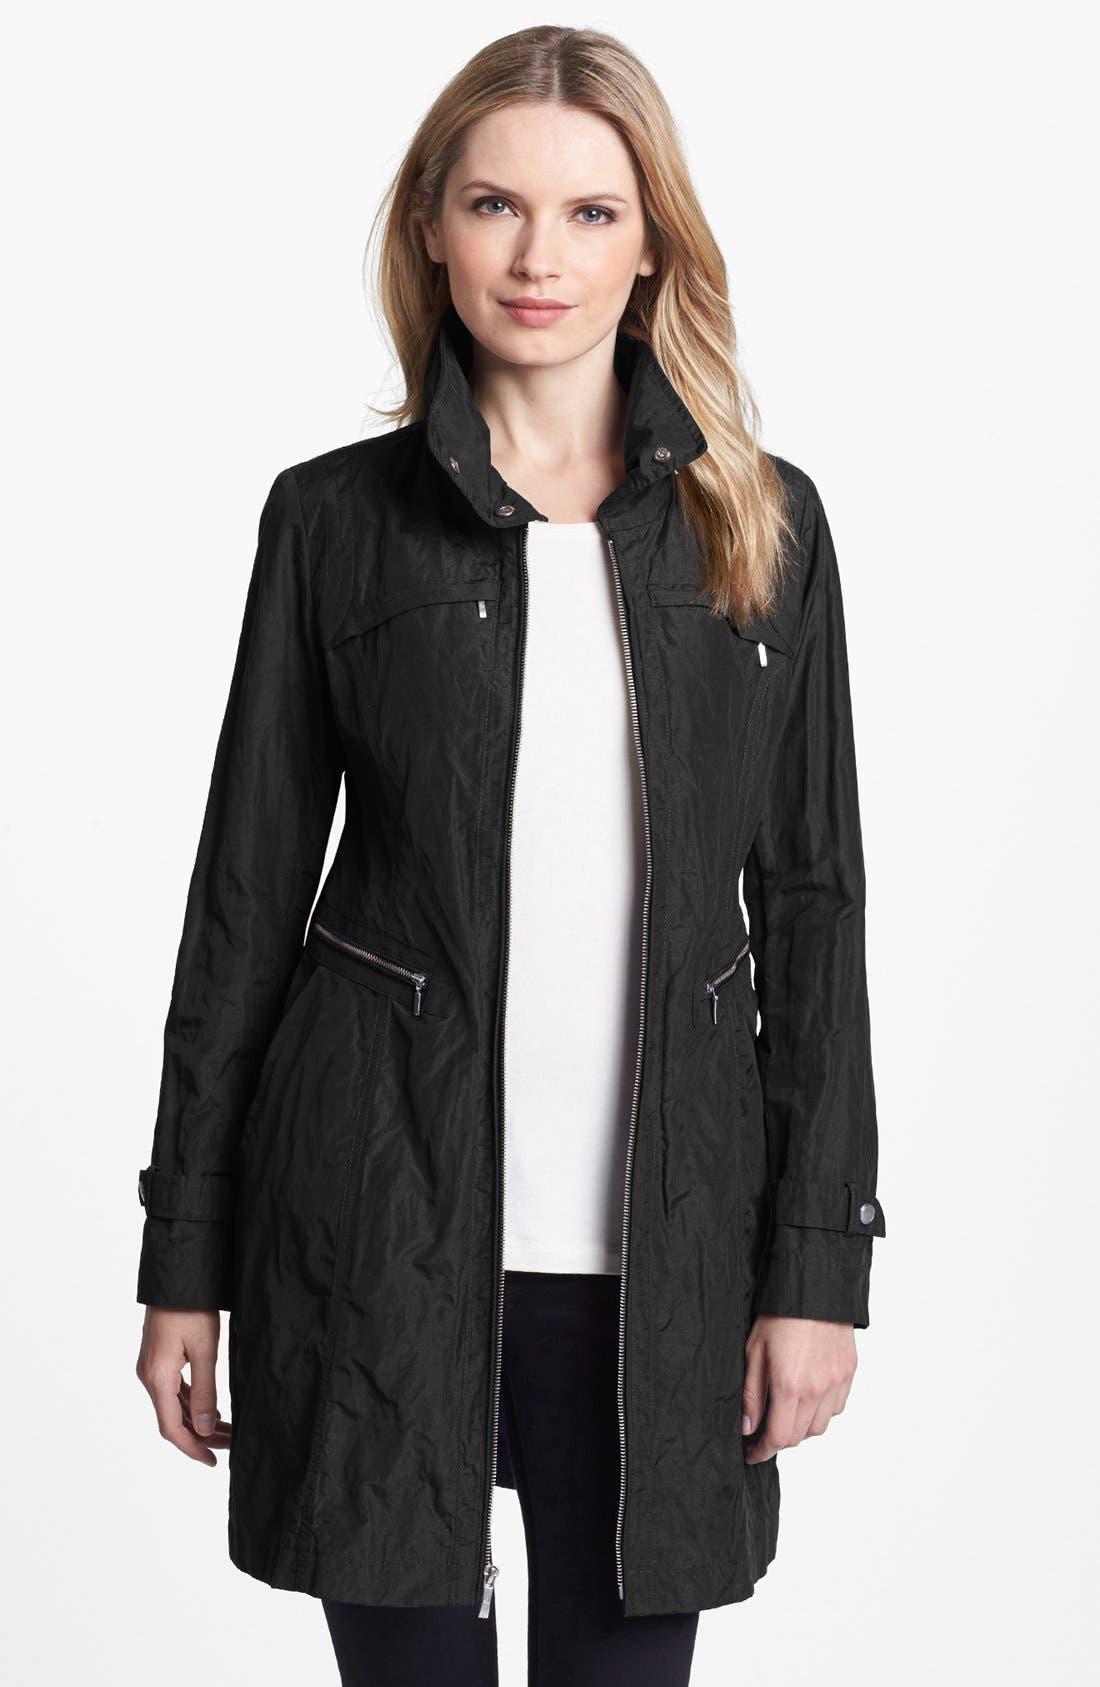 Alternate Image 1 Selected - Cole Haan Metallic Packable Jacket